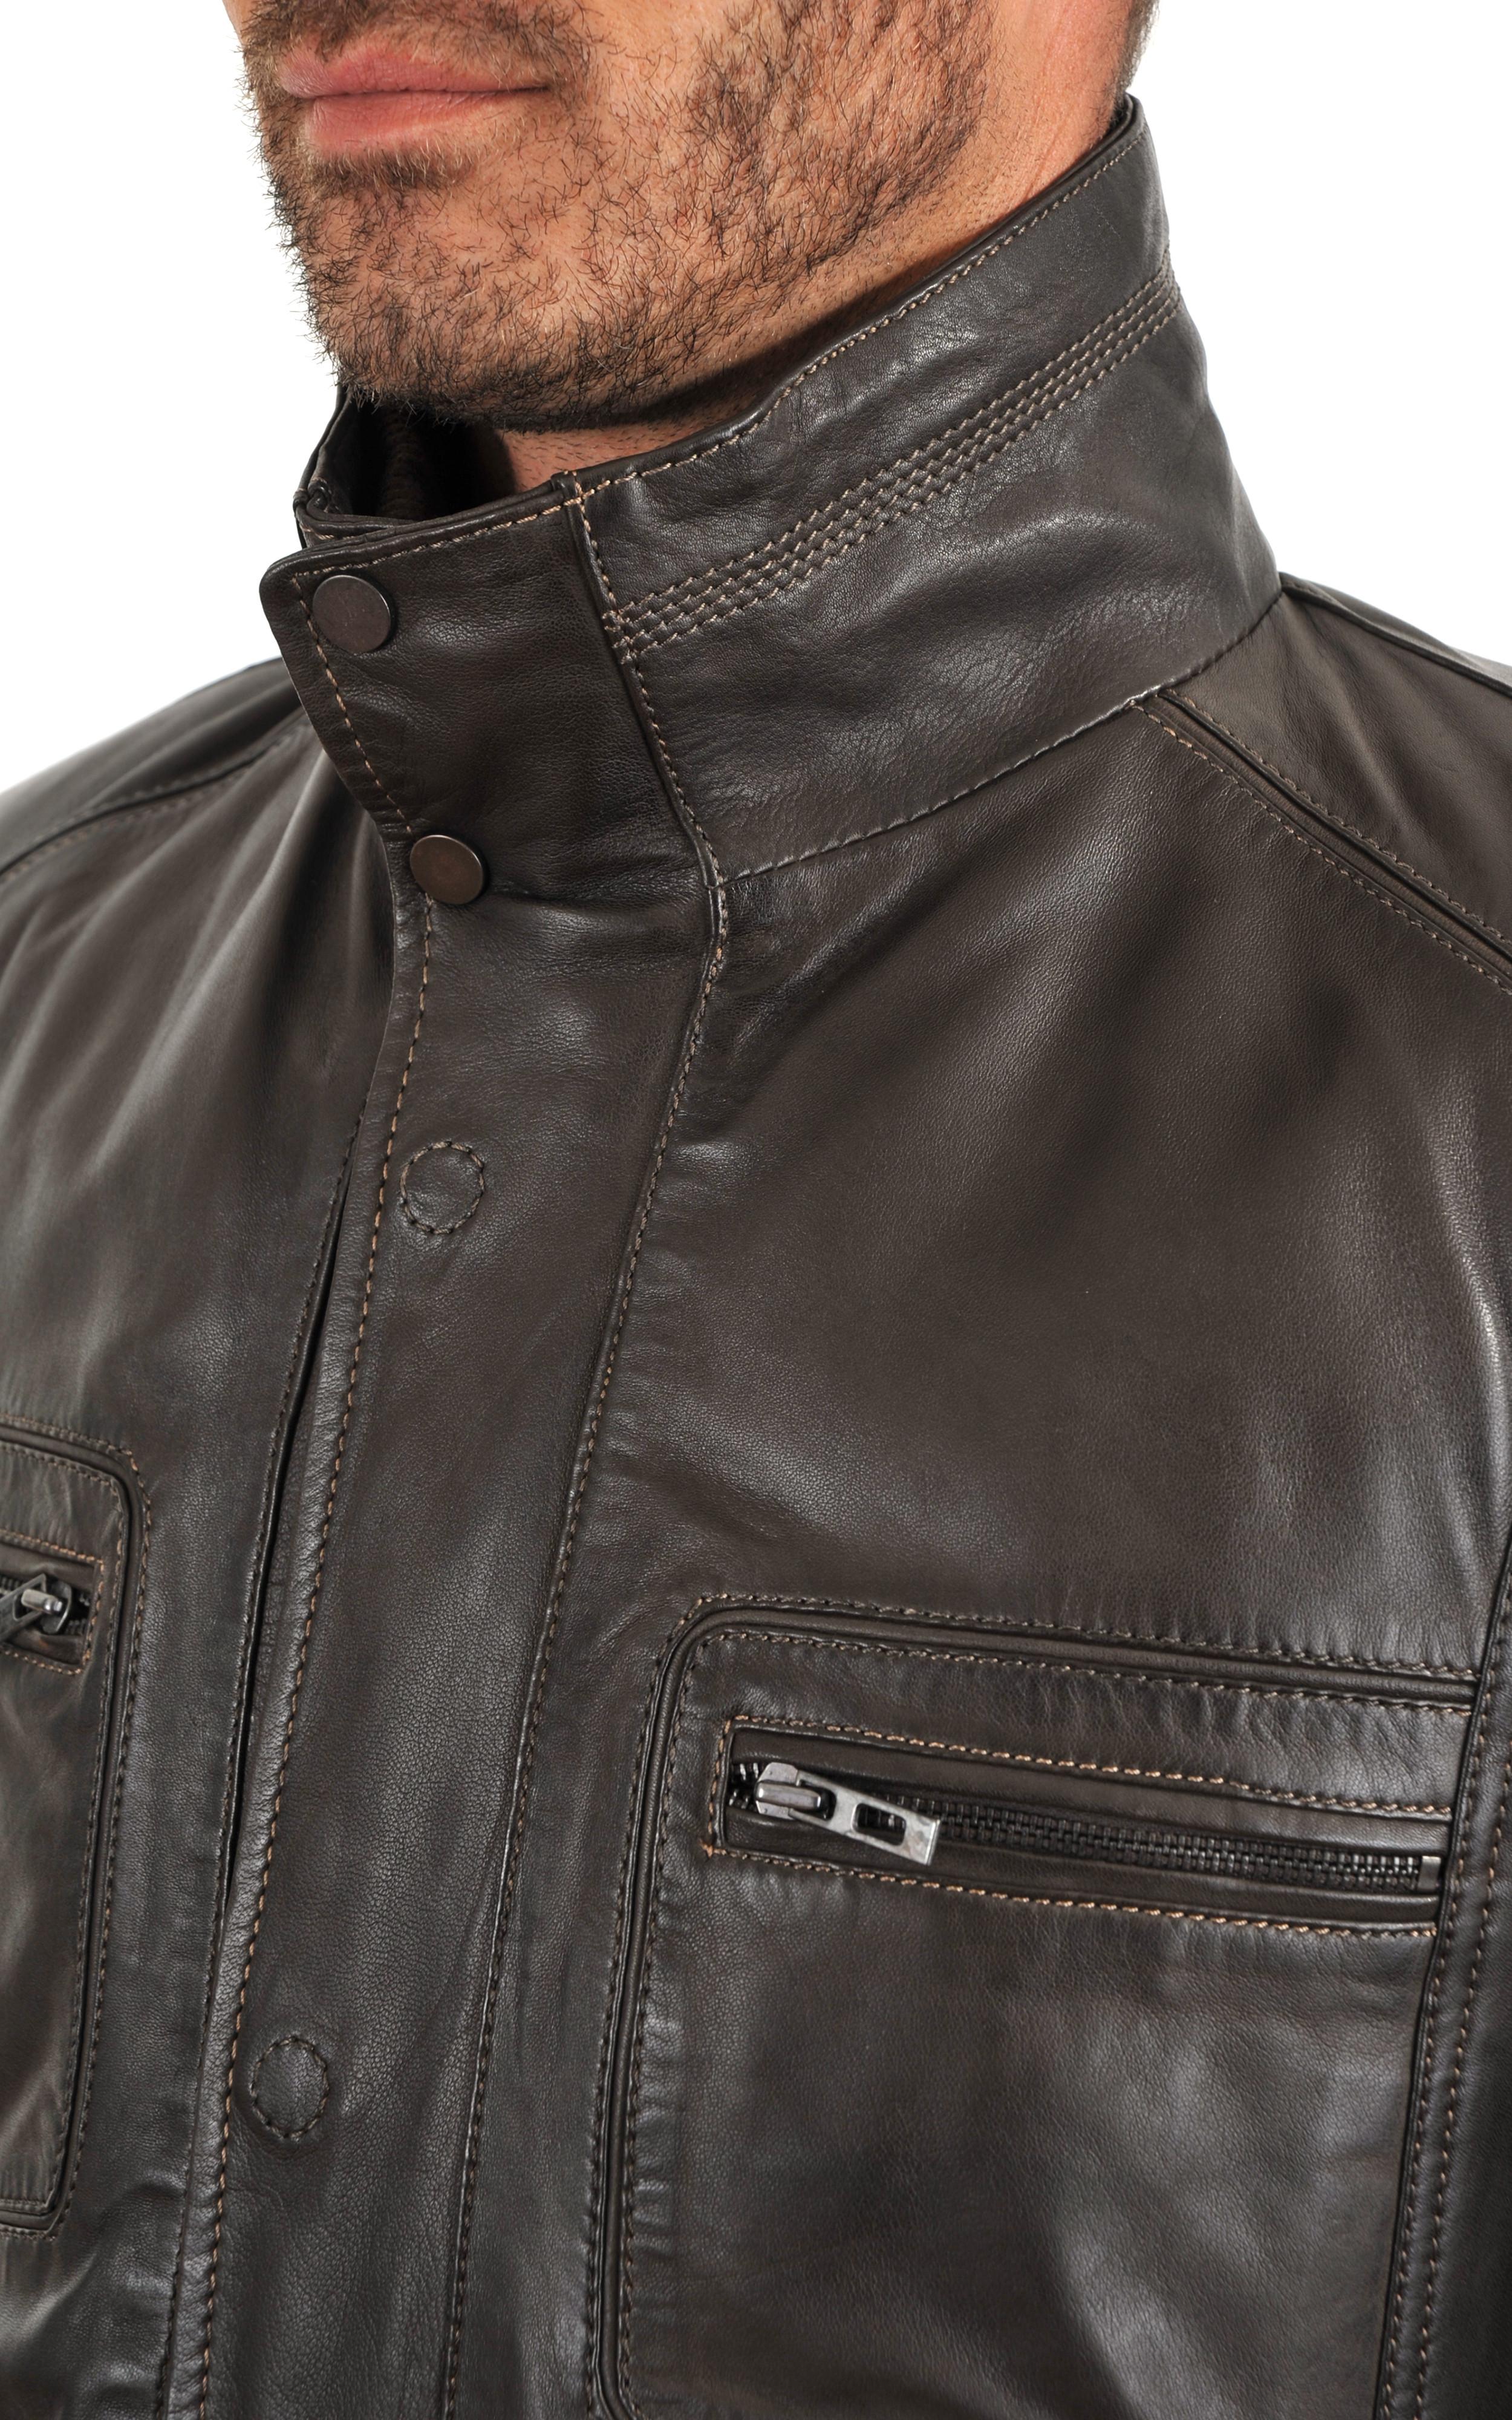 veste cuir homme bugatti la canadienne veste 3 4 cuir marron fonc. Black Bedroom Furniture Sets. Home Design Ideas